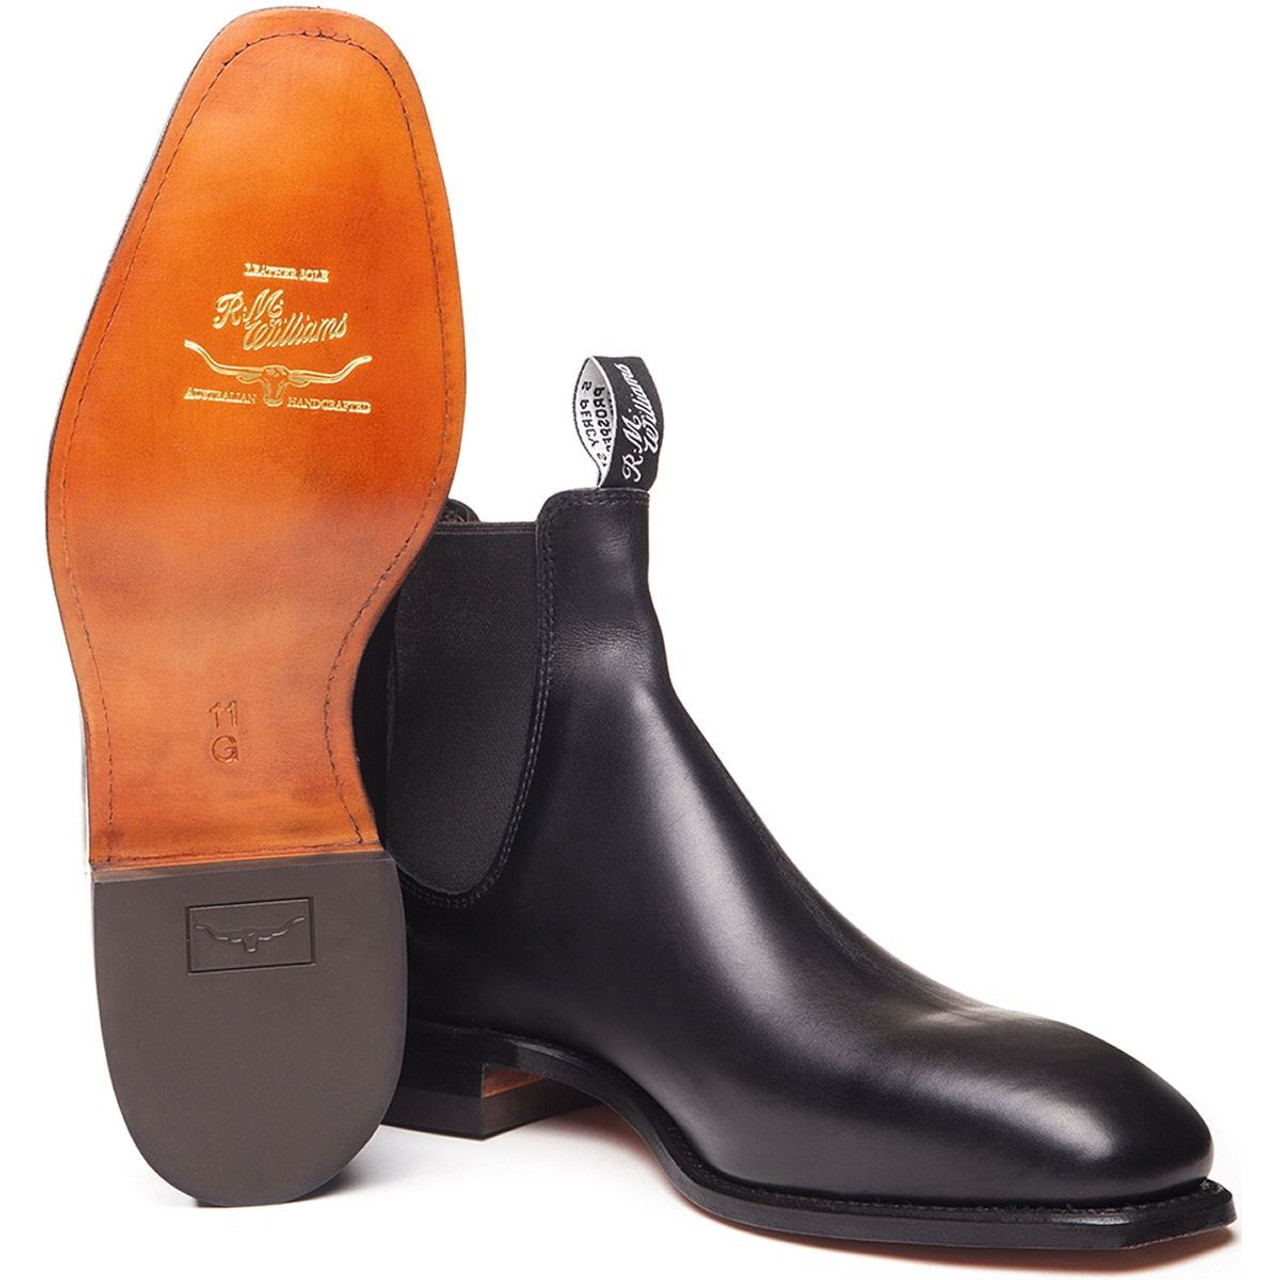 R.M. Williams Craftsman Boots